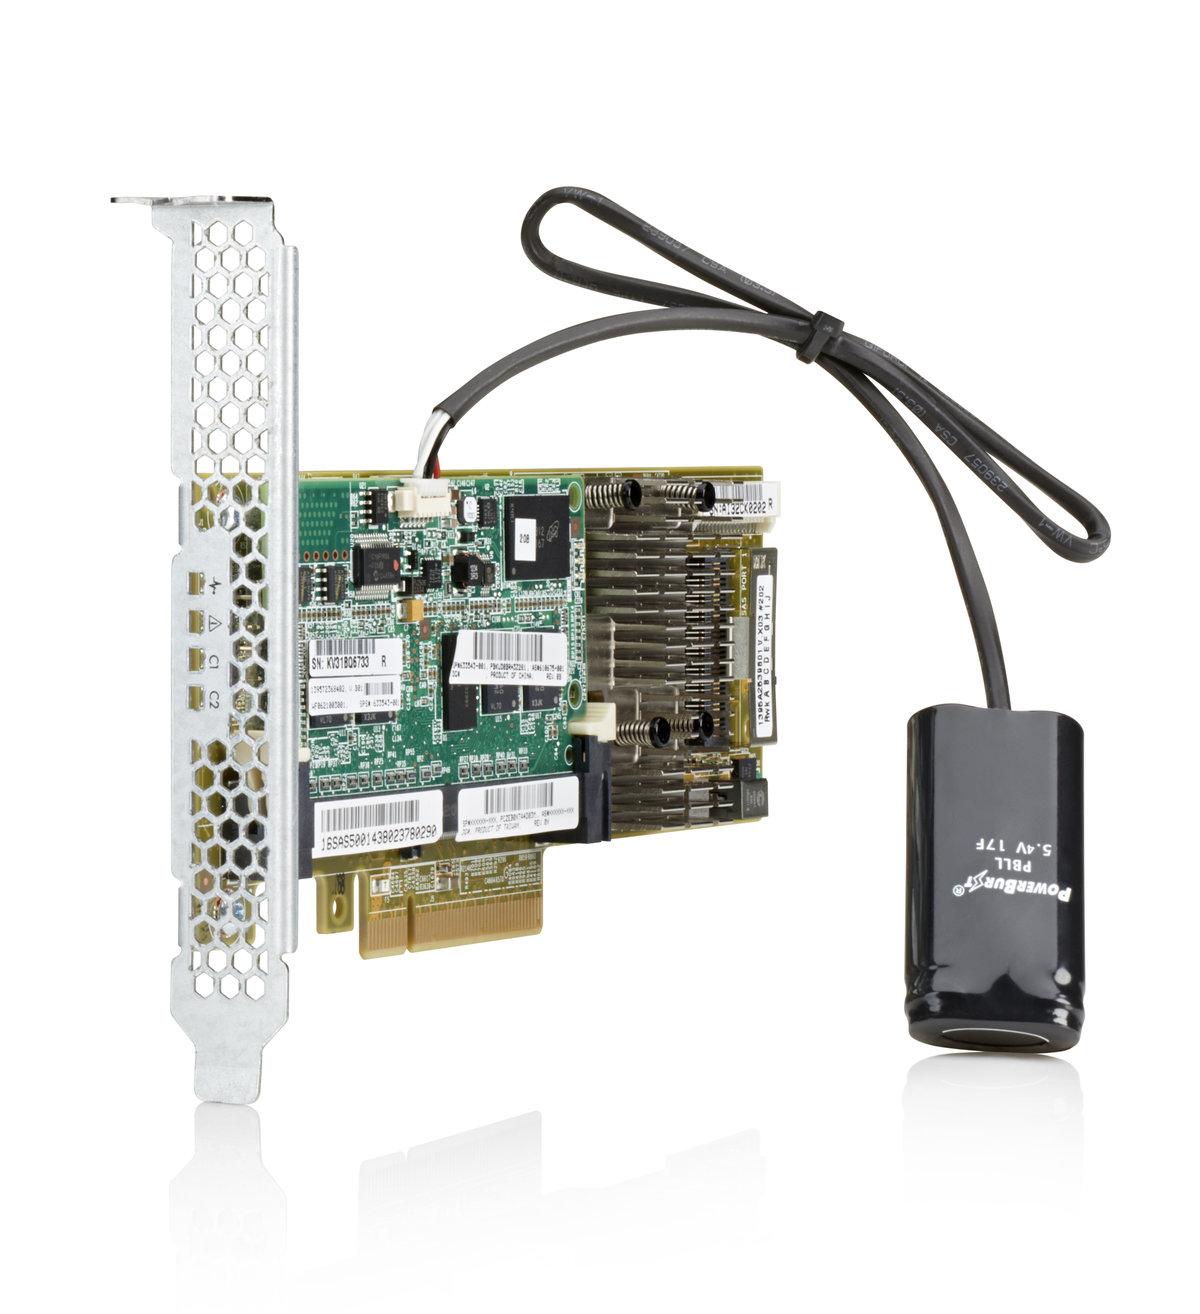 HPE Smart Array P430/2GB with FBWC - storage controller (RAID) - SATA 6Gb/s  / SAS 6Gb/s - PCIe 3 0 x8